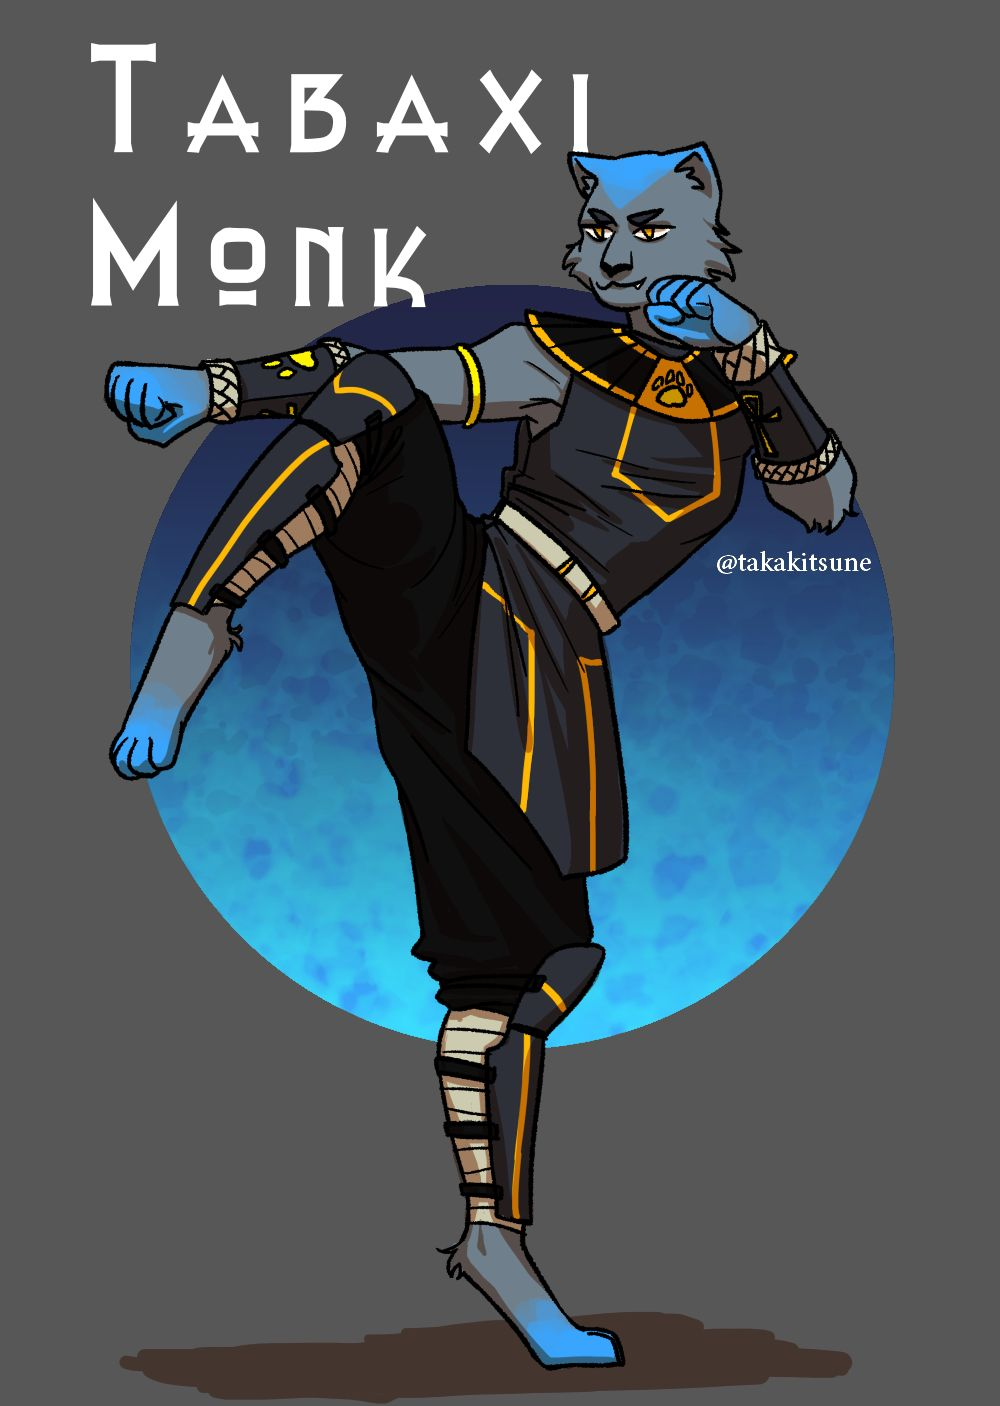 Avm Tabaxi Monk By Taka Kitsune On Deviantart Eric belisle as a player: avm tabaxi monk by taka kitsune on